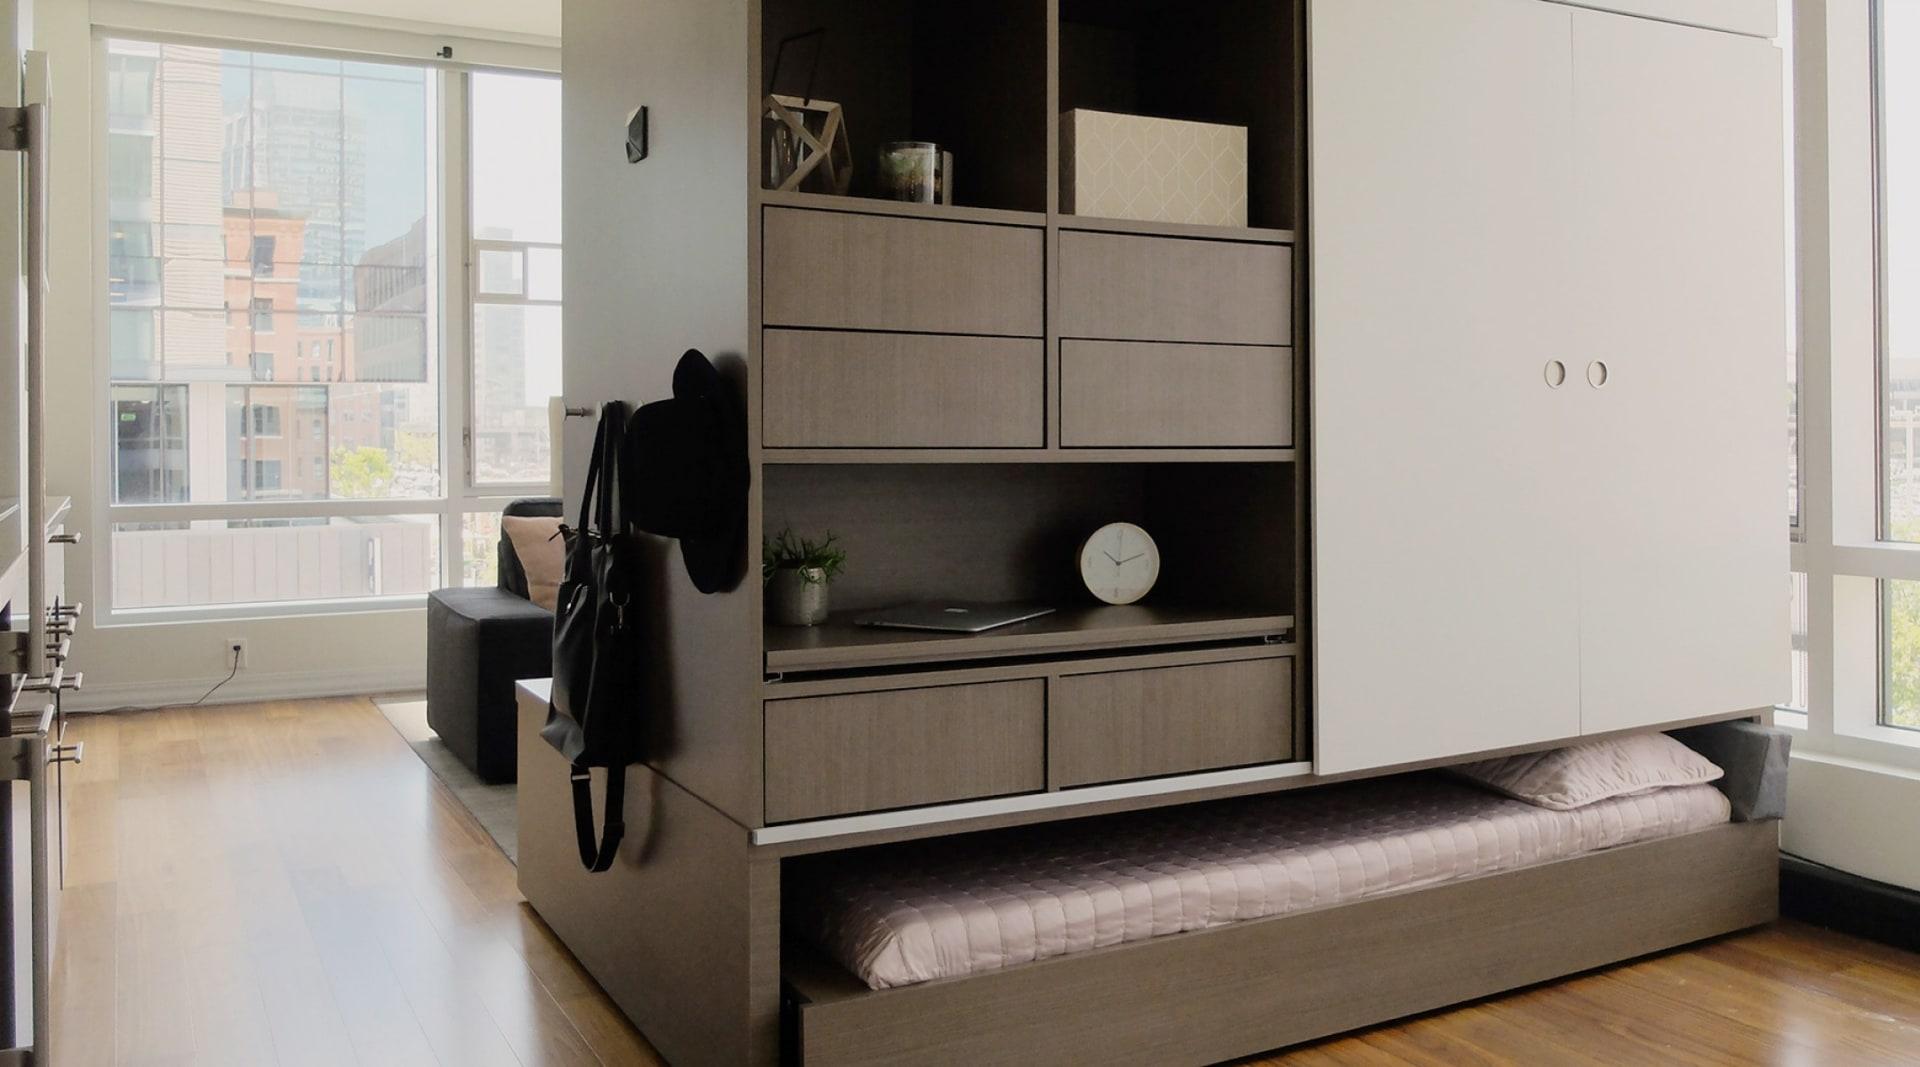 WEB Ori 2 Bedroom bed in